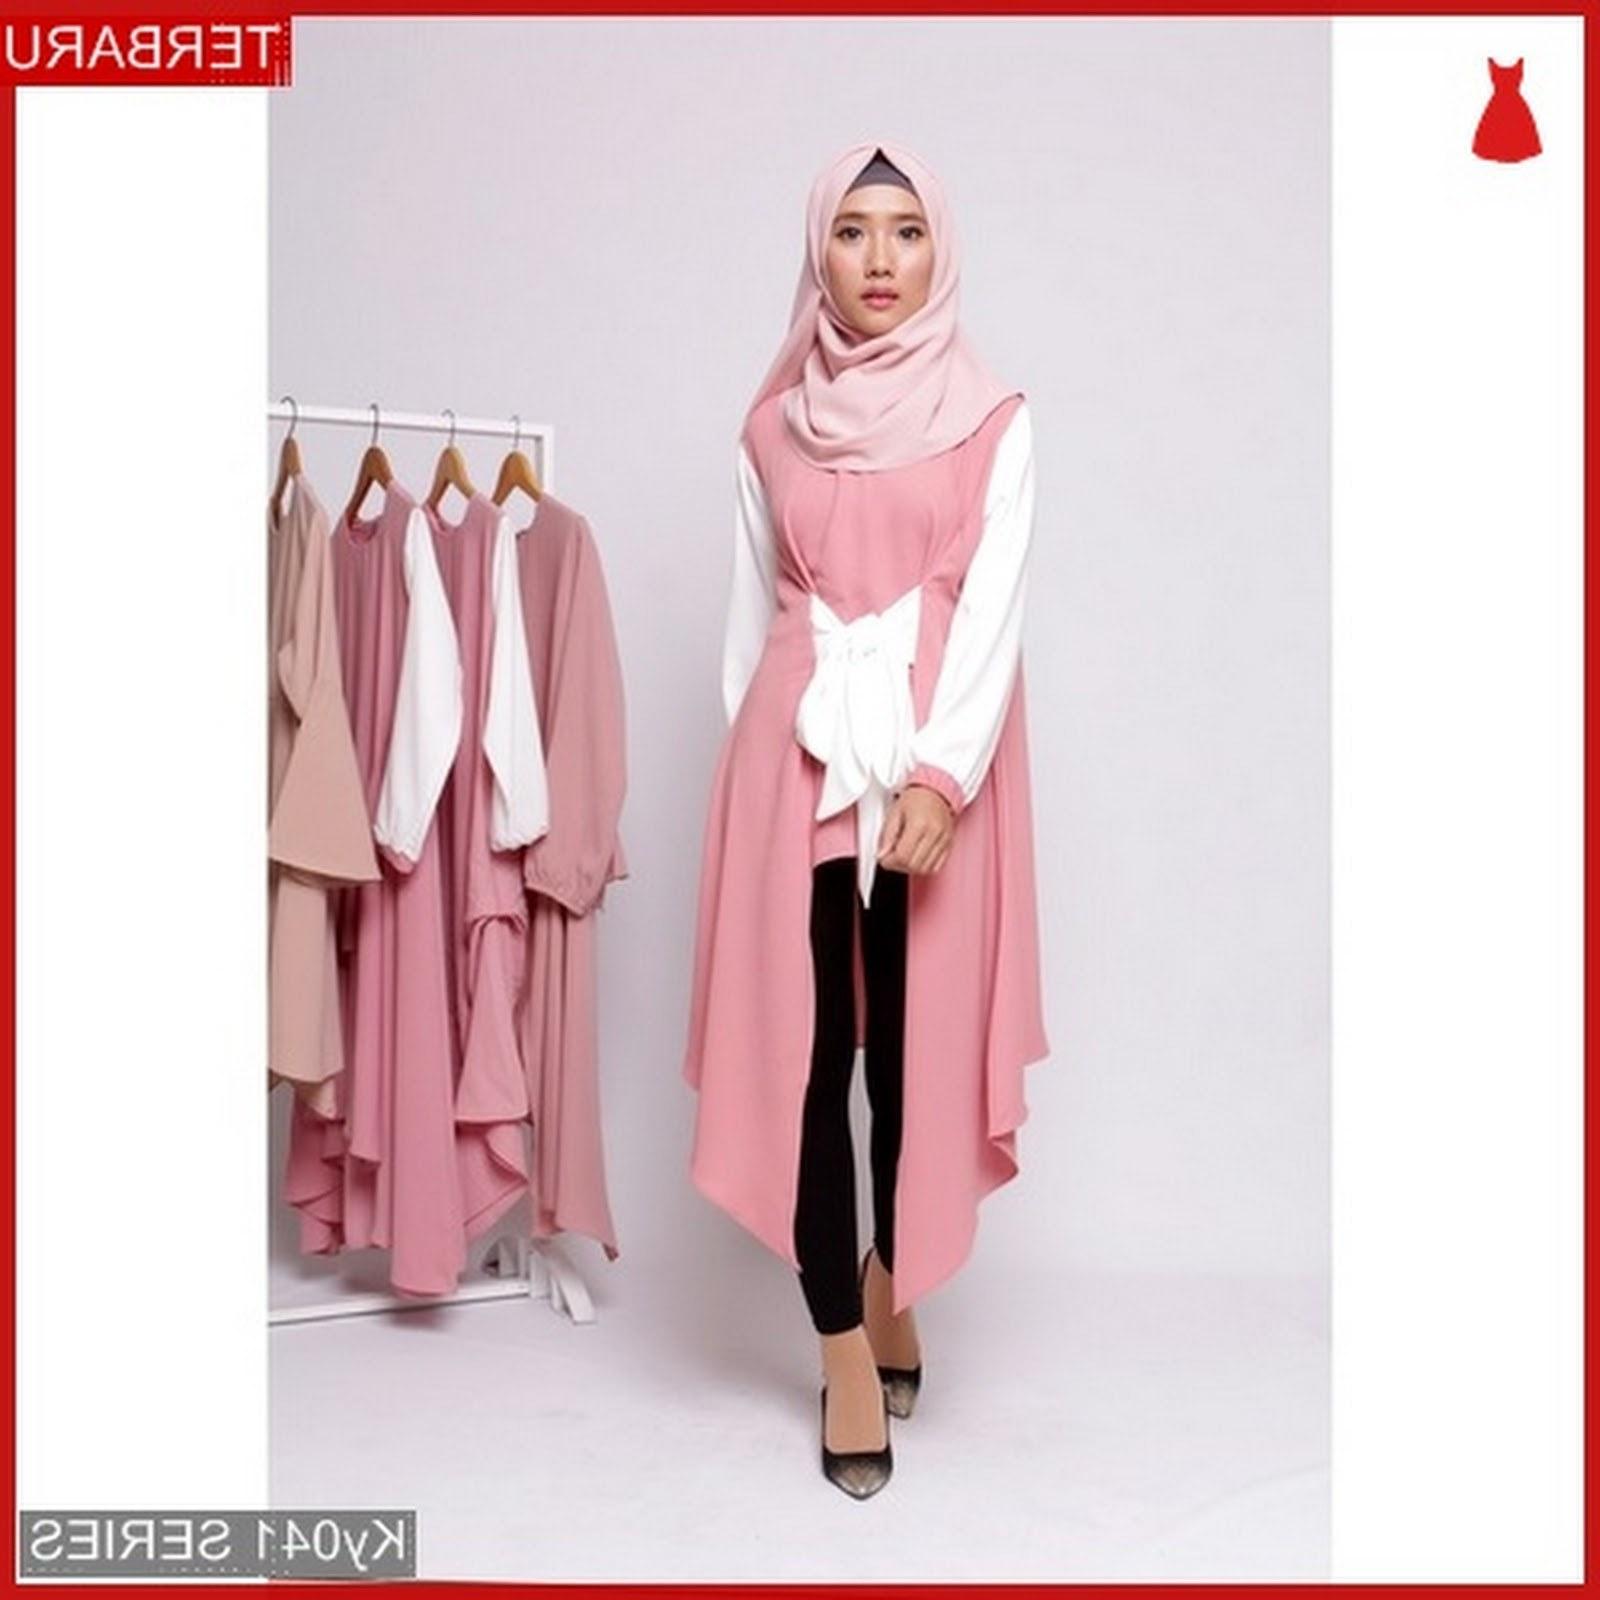 Ide Baju Lebaran Keren S5d8 Dapatkan Baju Muslim Lebaran Paling Keren Terbaru Di Bmg